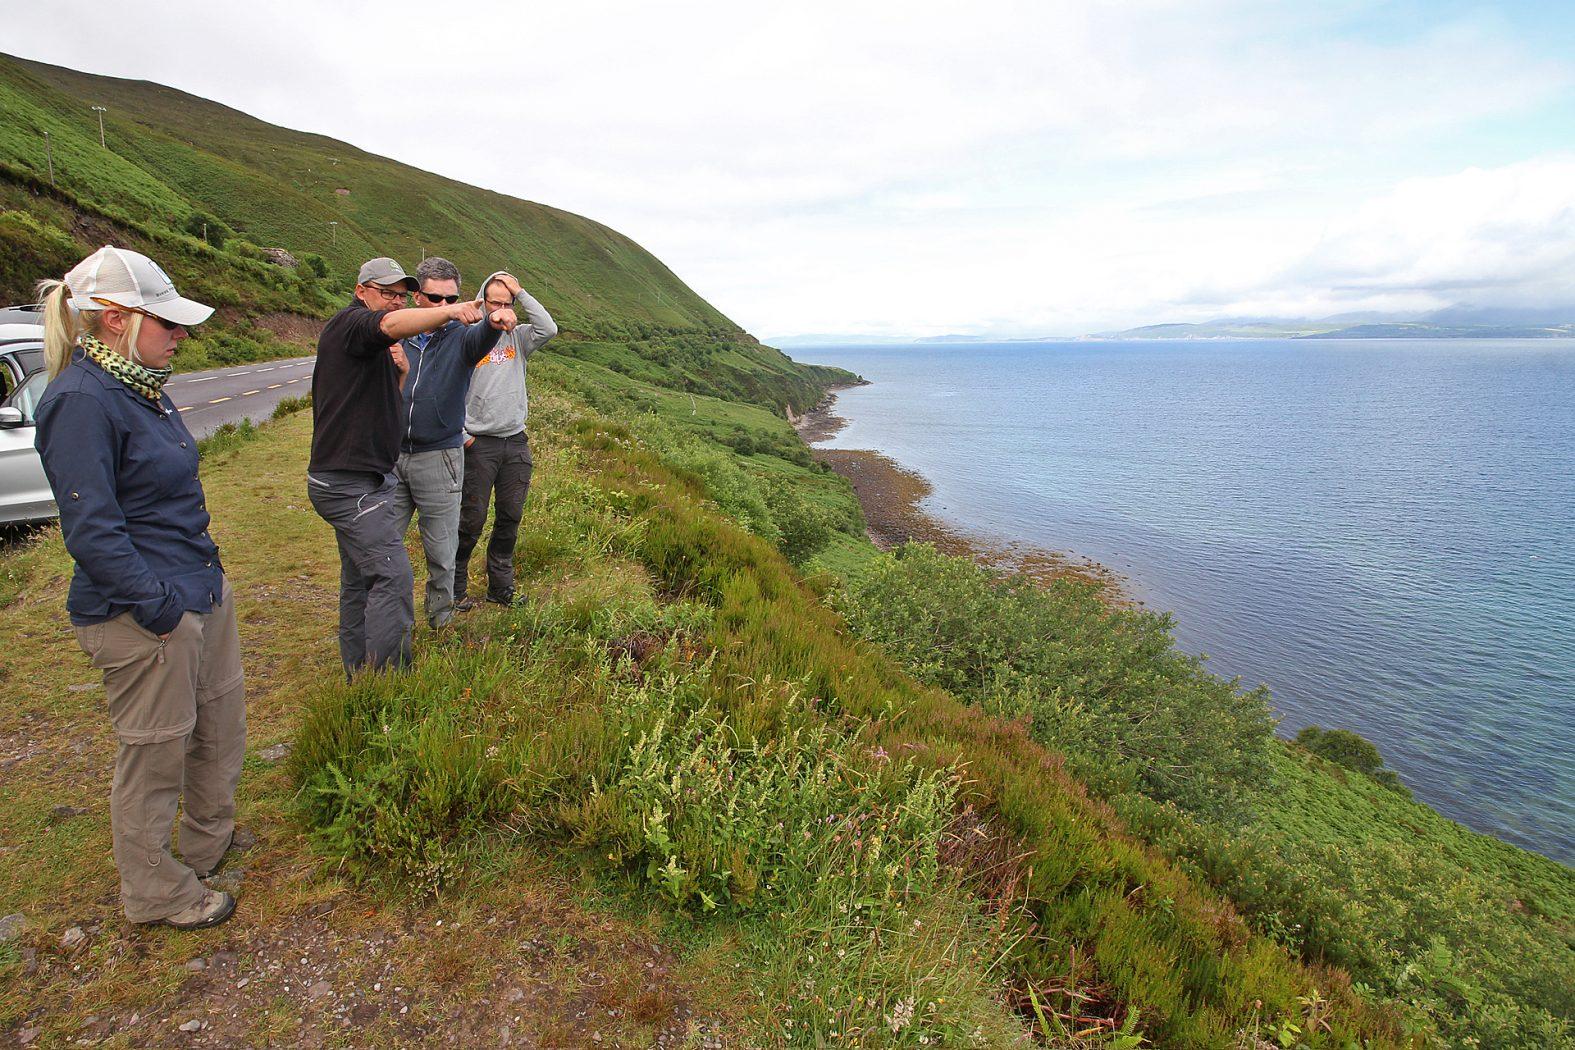 Angelurlaub in Irland